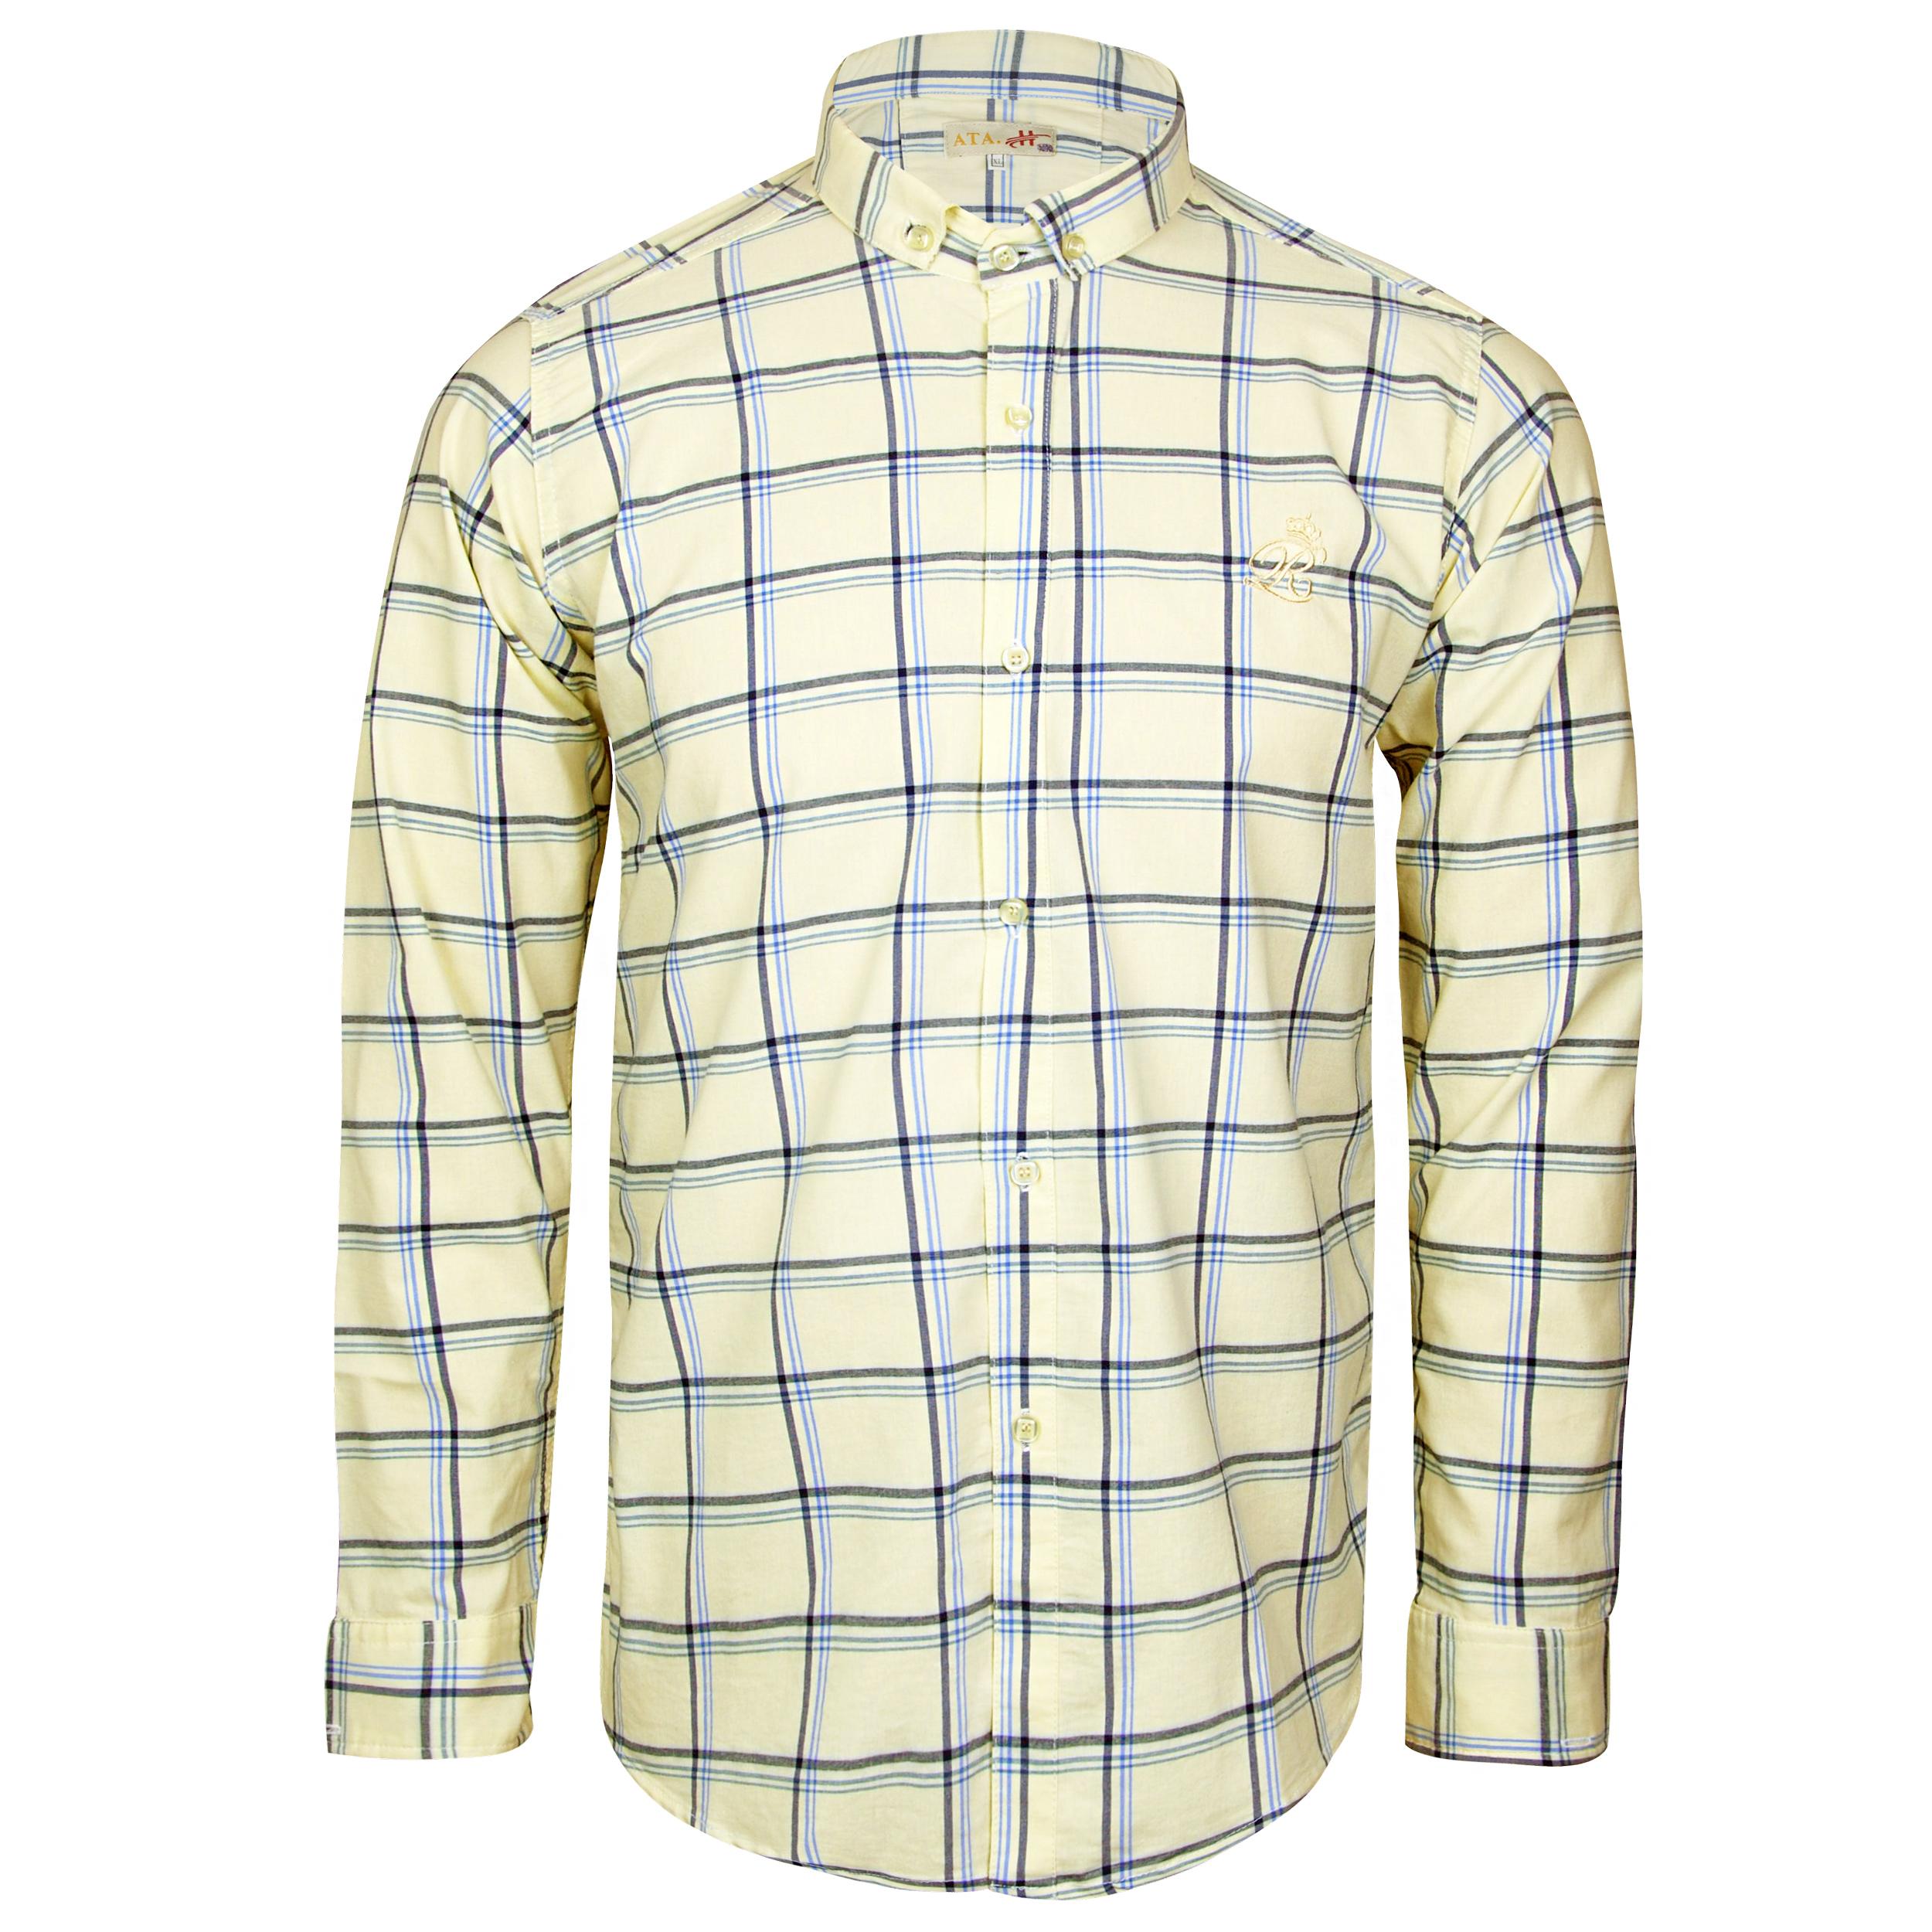 پیراهن مردانه کد 3230-16